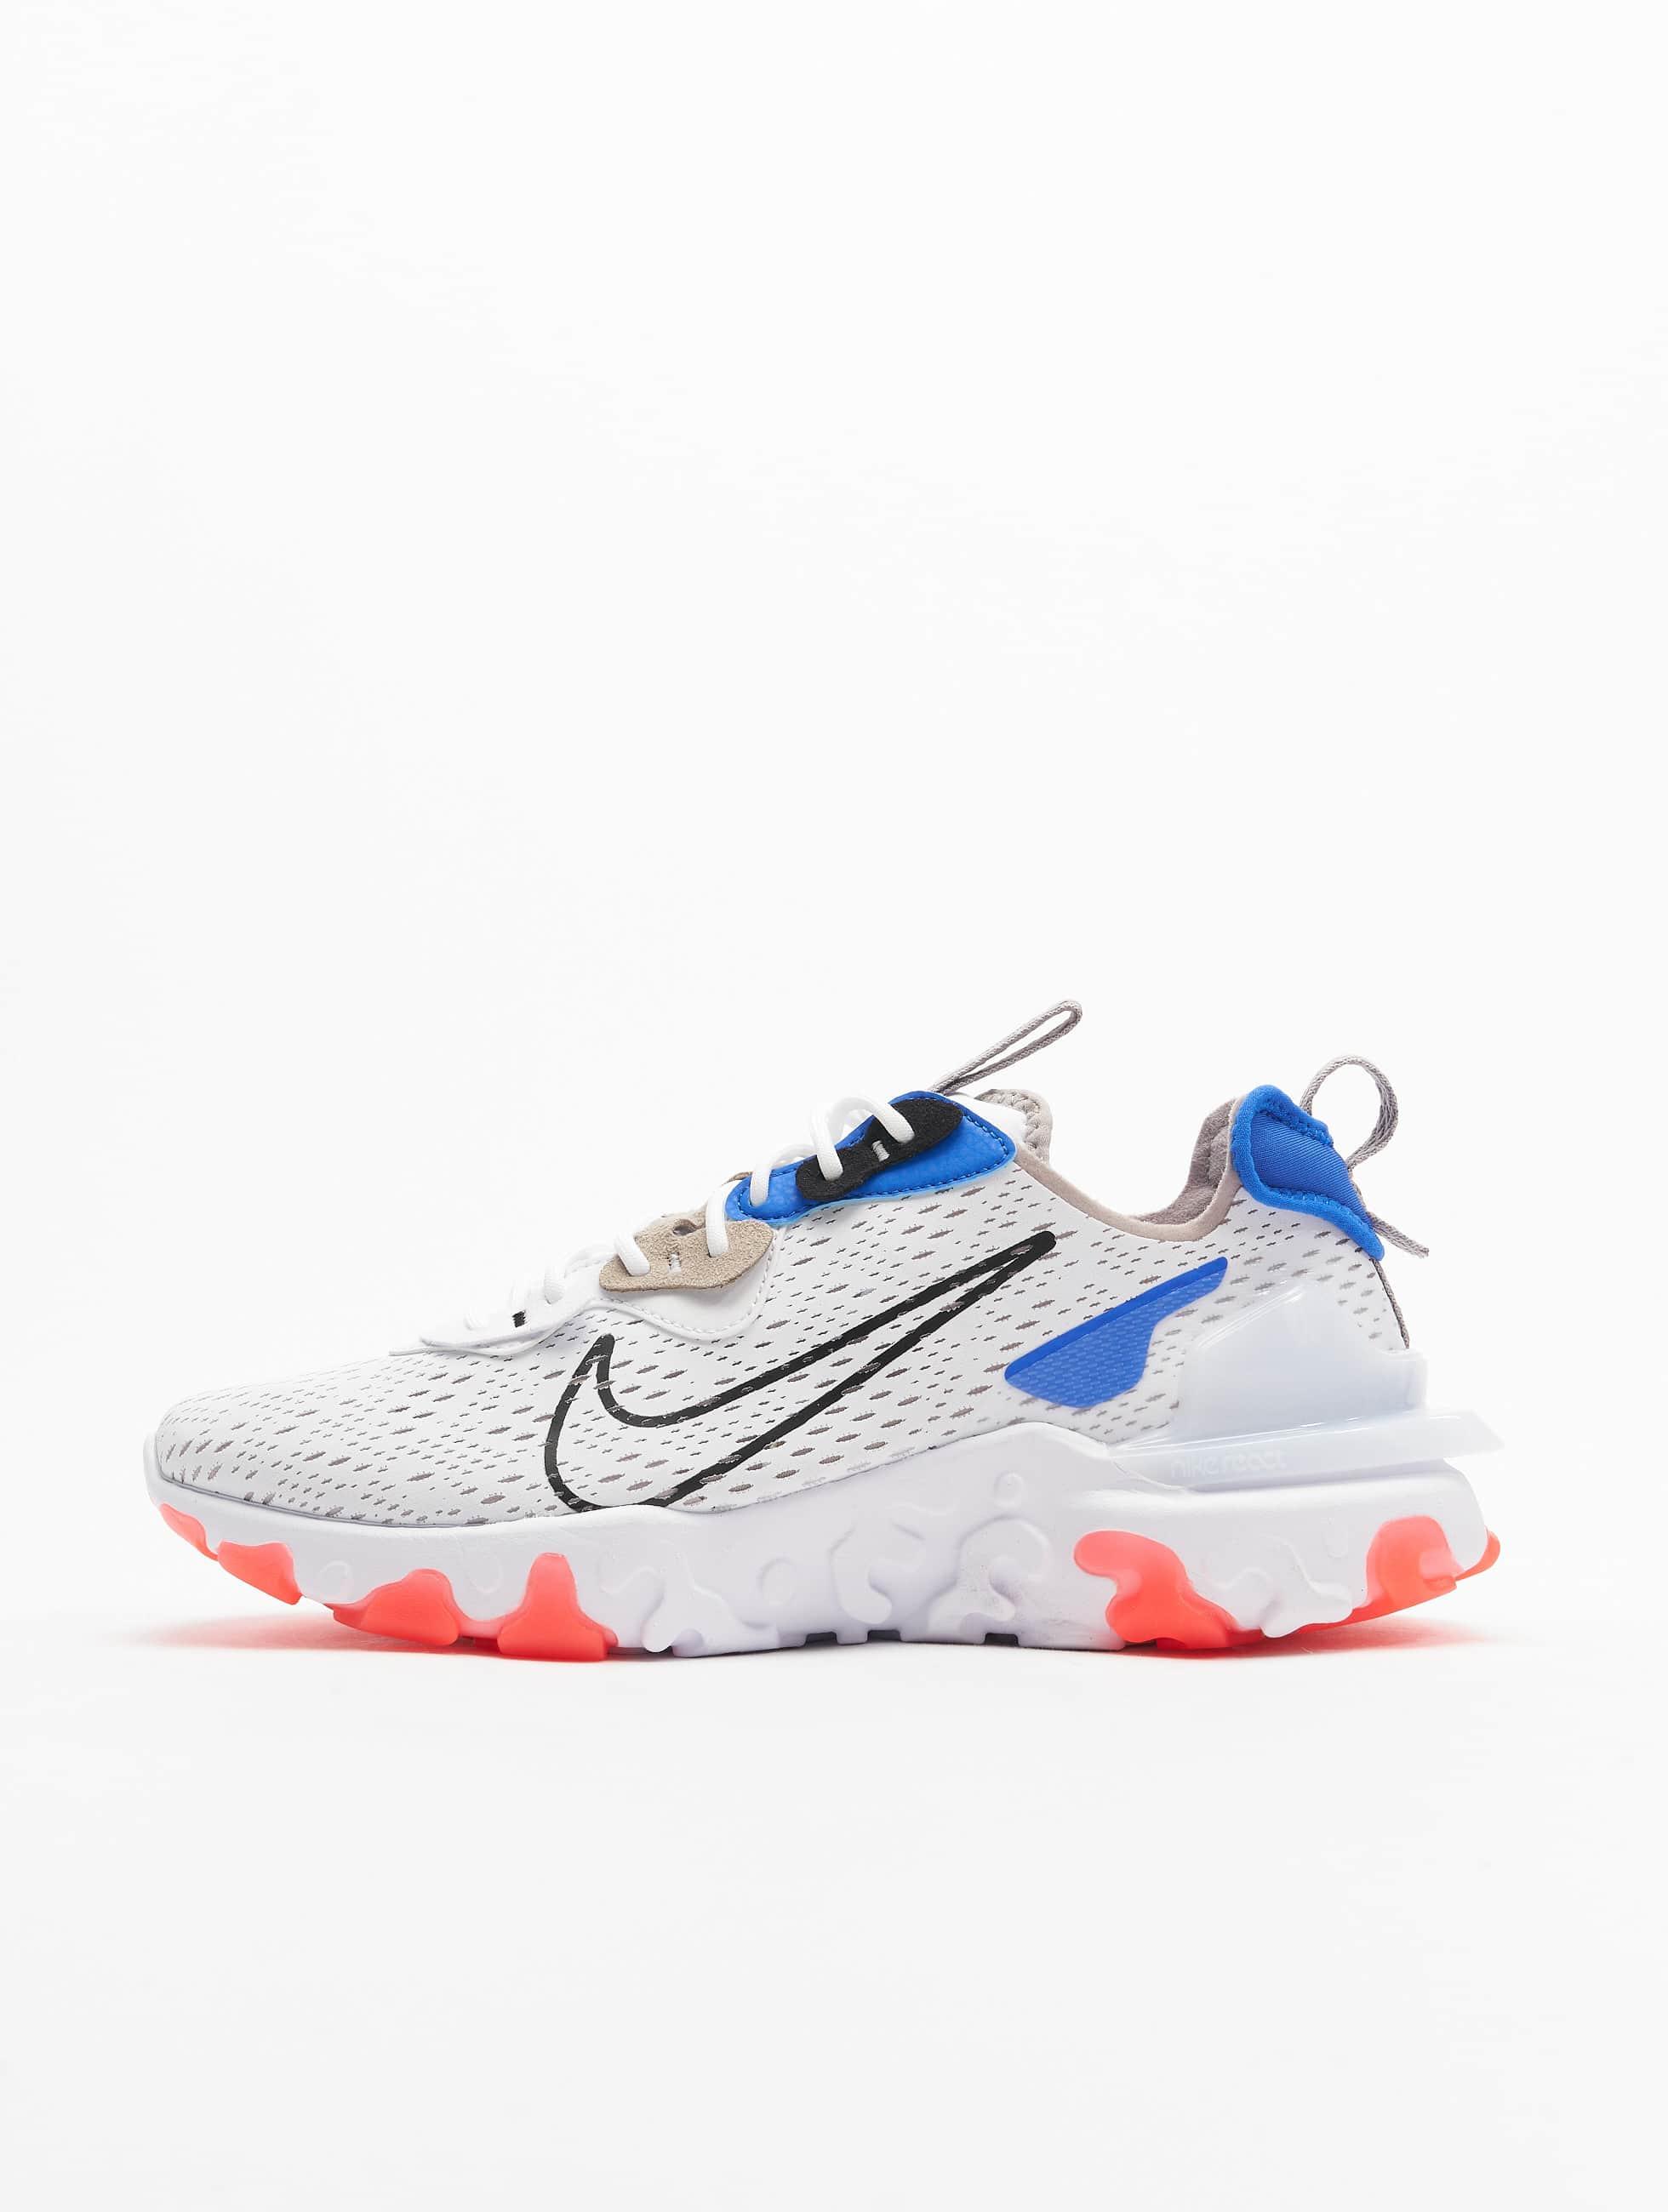 Nike React Vision Sneakers White/Black/Racer Blue/Bright Crimson